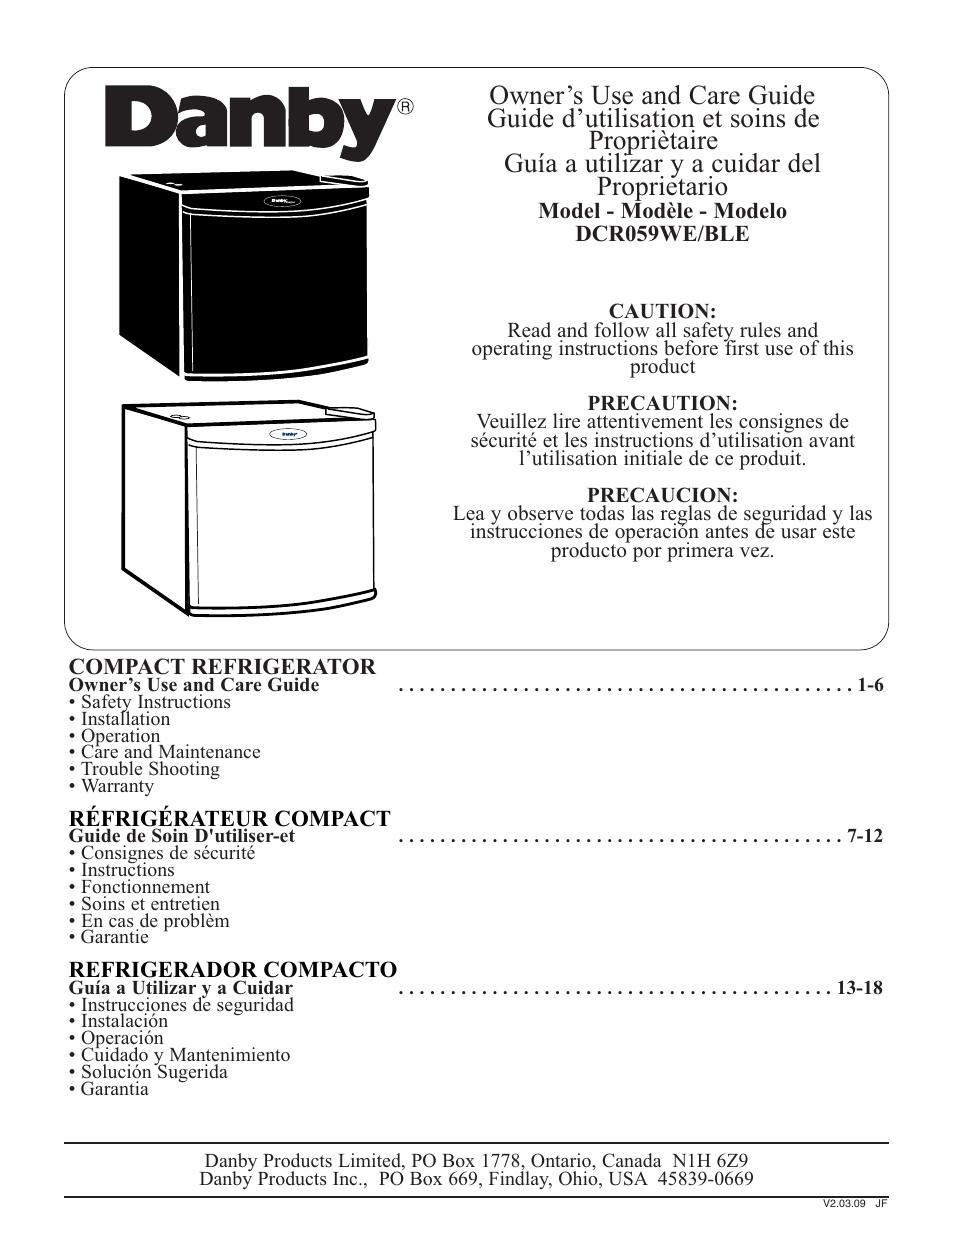 danby refrigerator manual image refrigerator nabateans org rh nabateans org danby diplomat mini fridge manual danby diplomat mini fridge manual